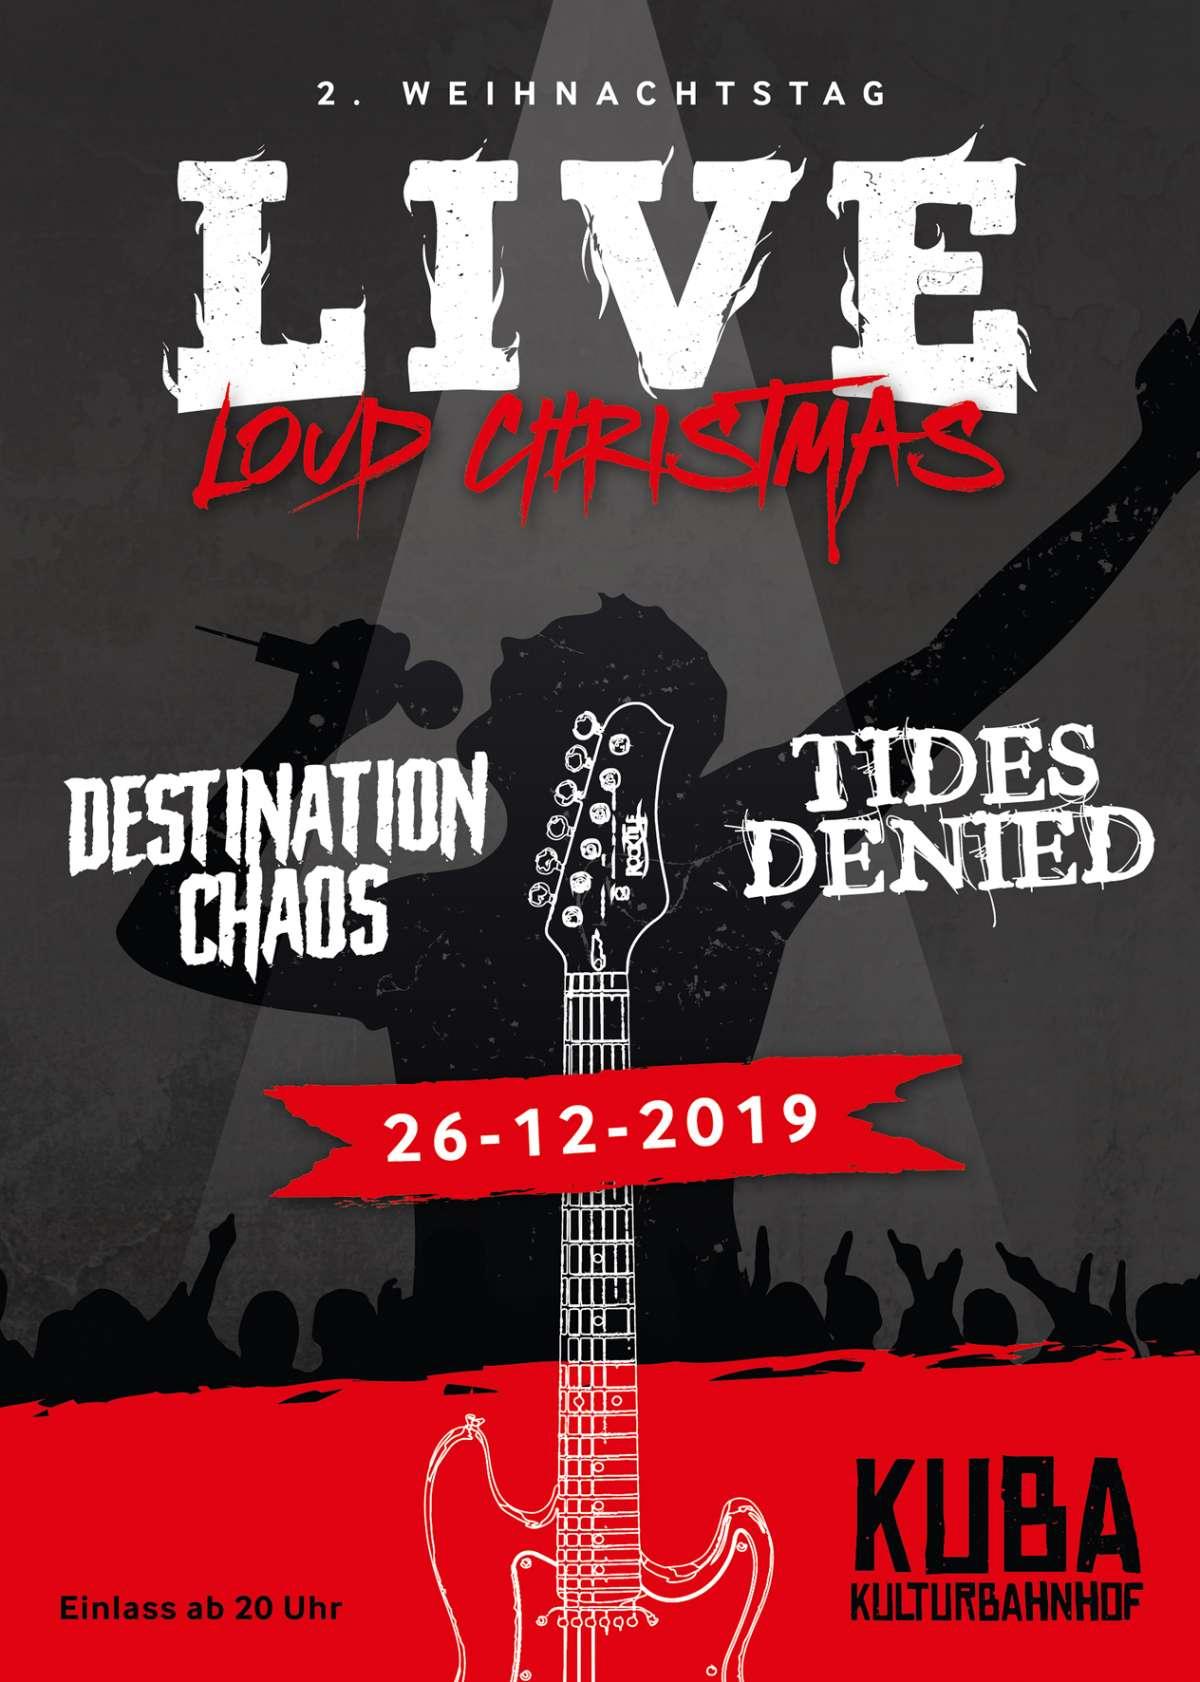 Loud Christmas - Destination Chaos & Tides Denied  - KUBA - Warburg-Welda